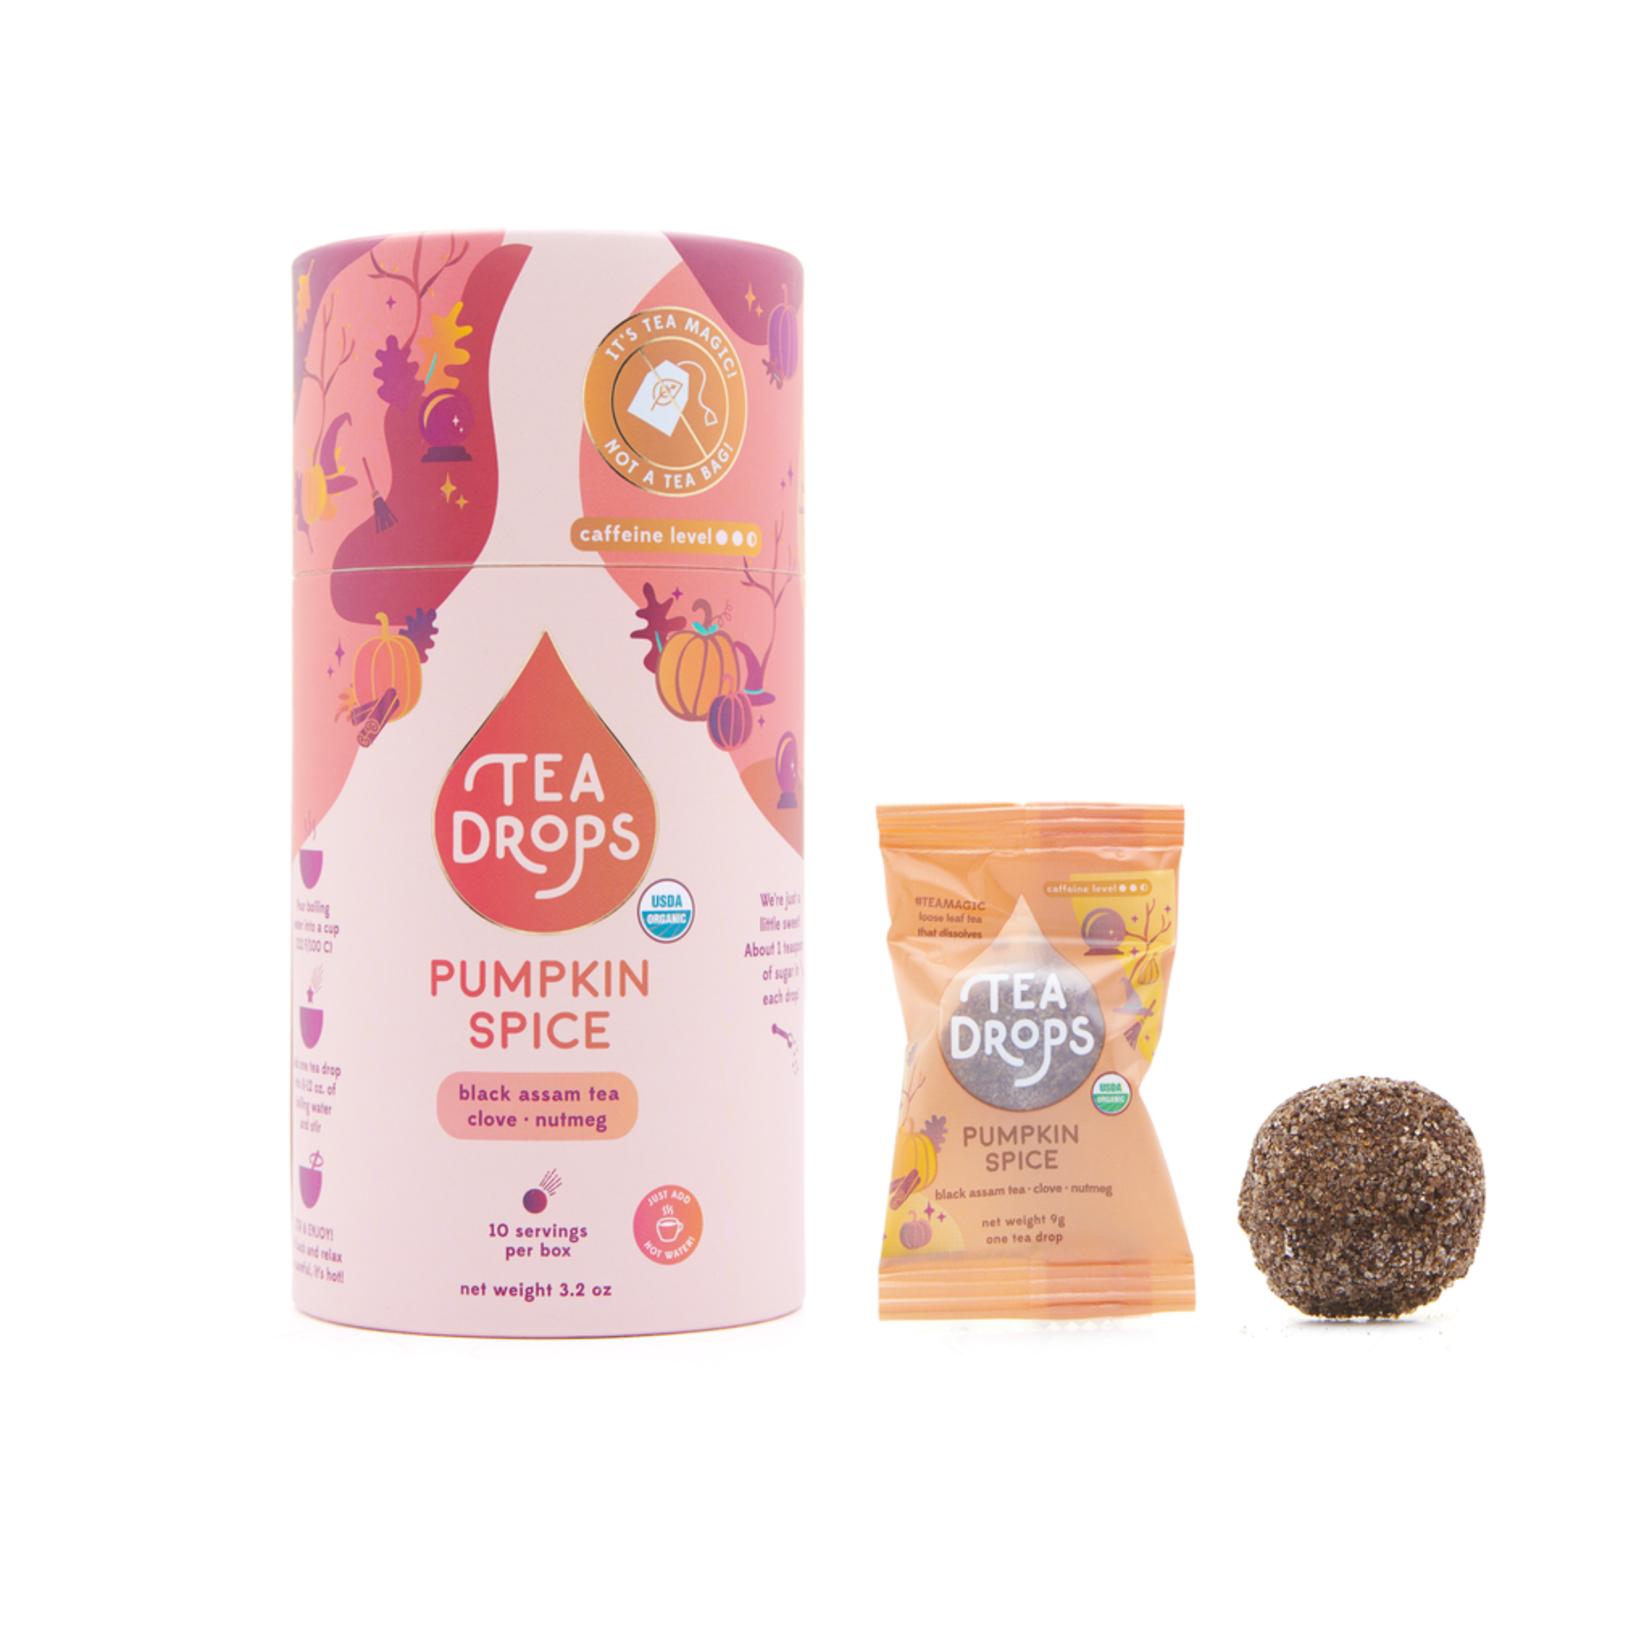 Tea Drops Pumpkin Spice Cylinder of 10 bags